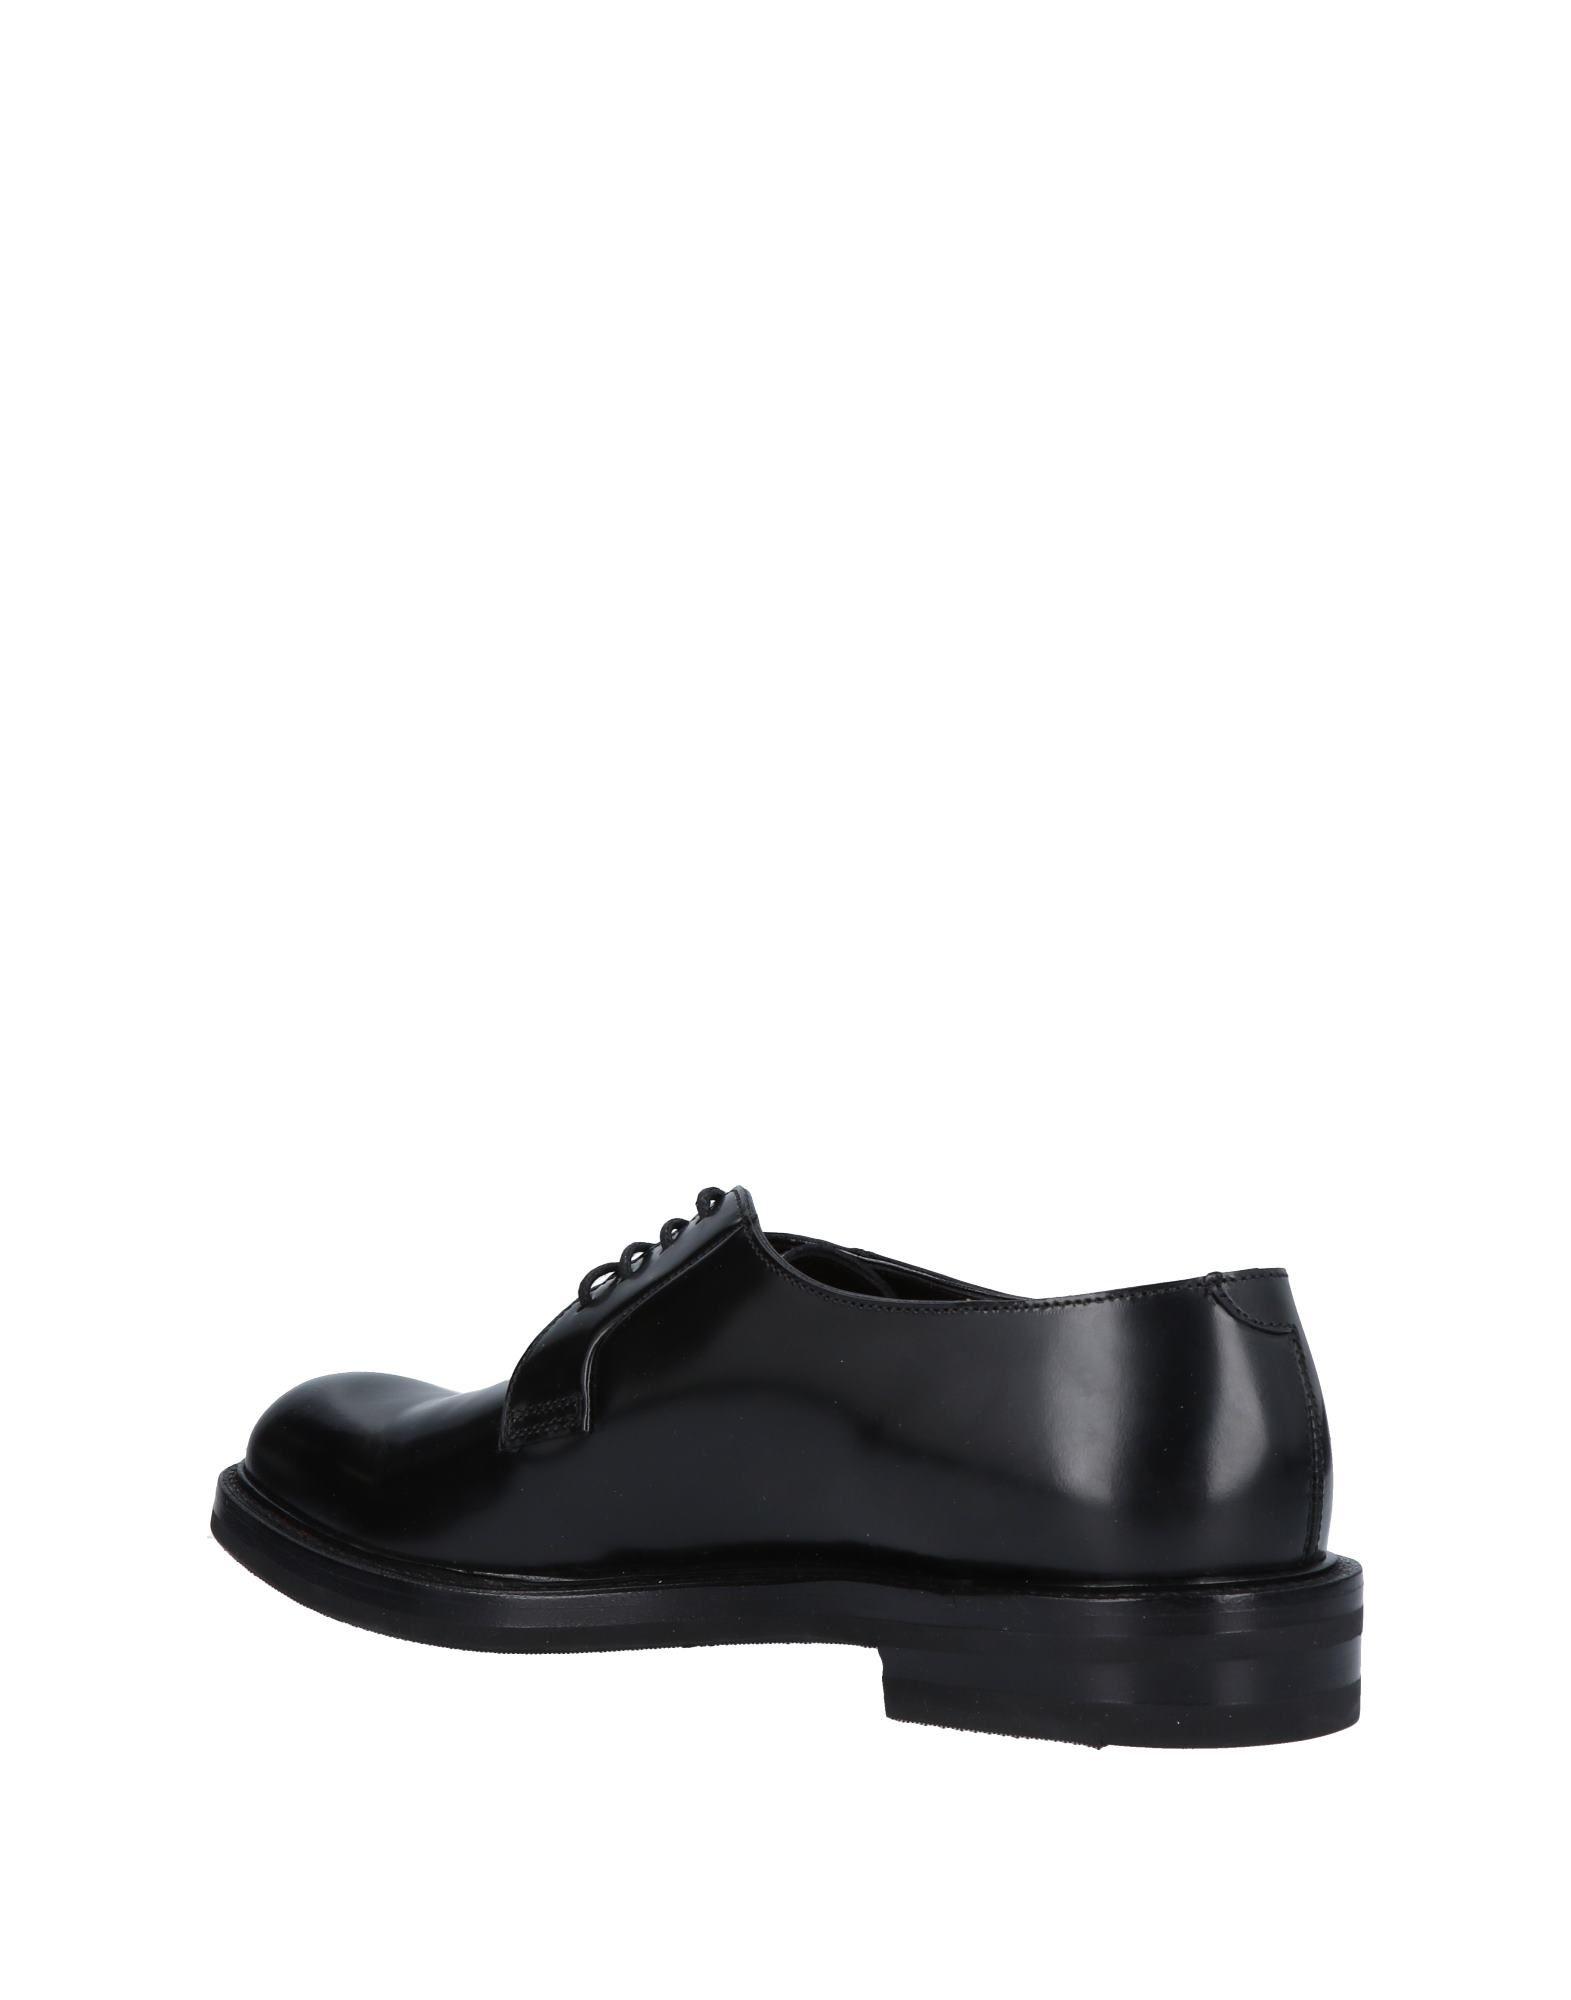 Stilvolle billige Schnürschuhe Schuhe Ortigni Schnürschuhe billige Damen  11465934KA 40f967